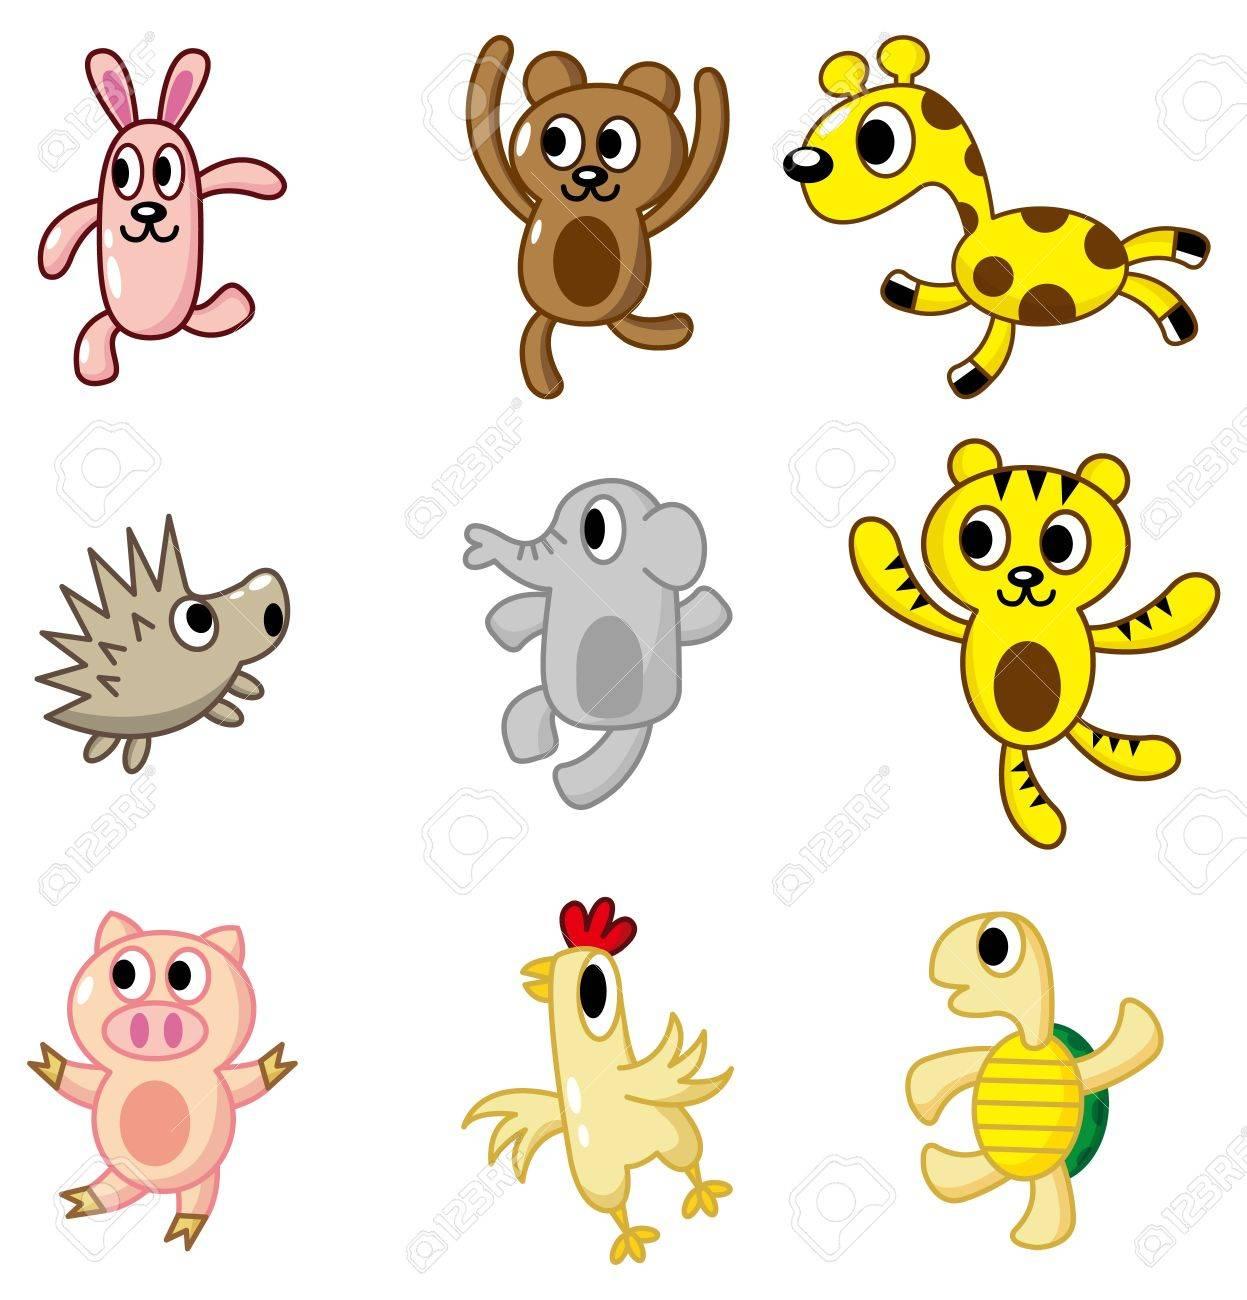 cartoon animal icon Stock Vector - 8545627